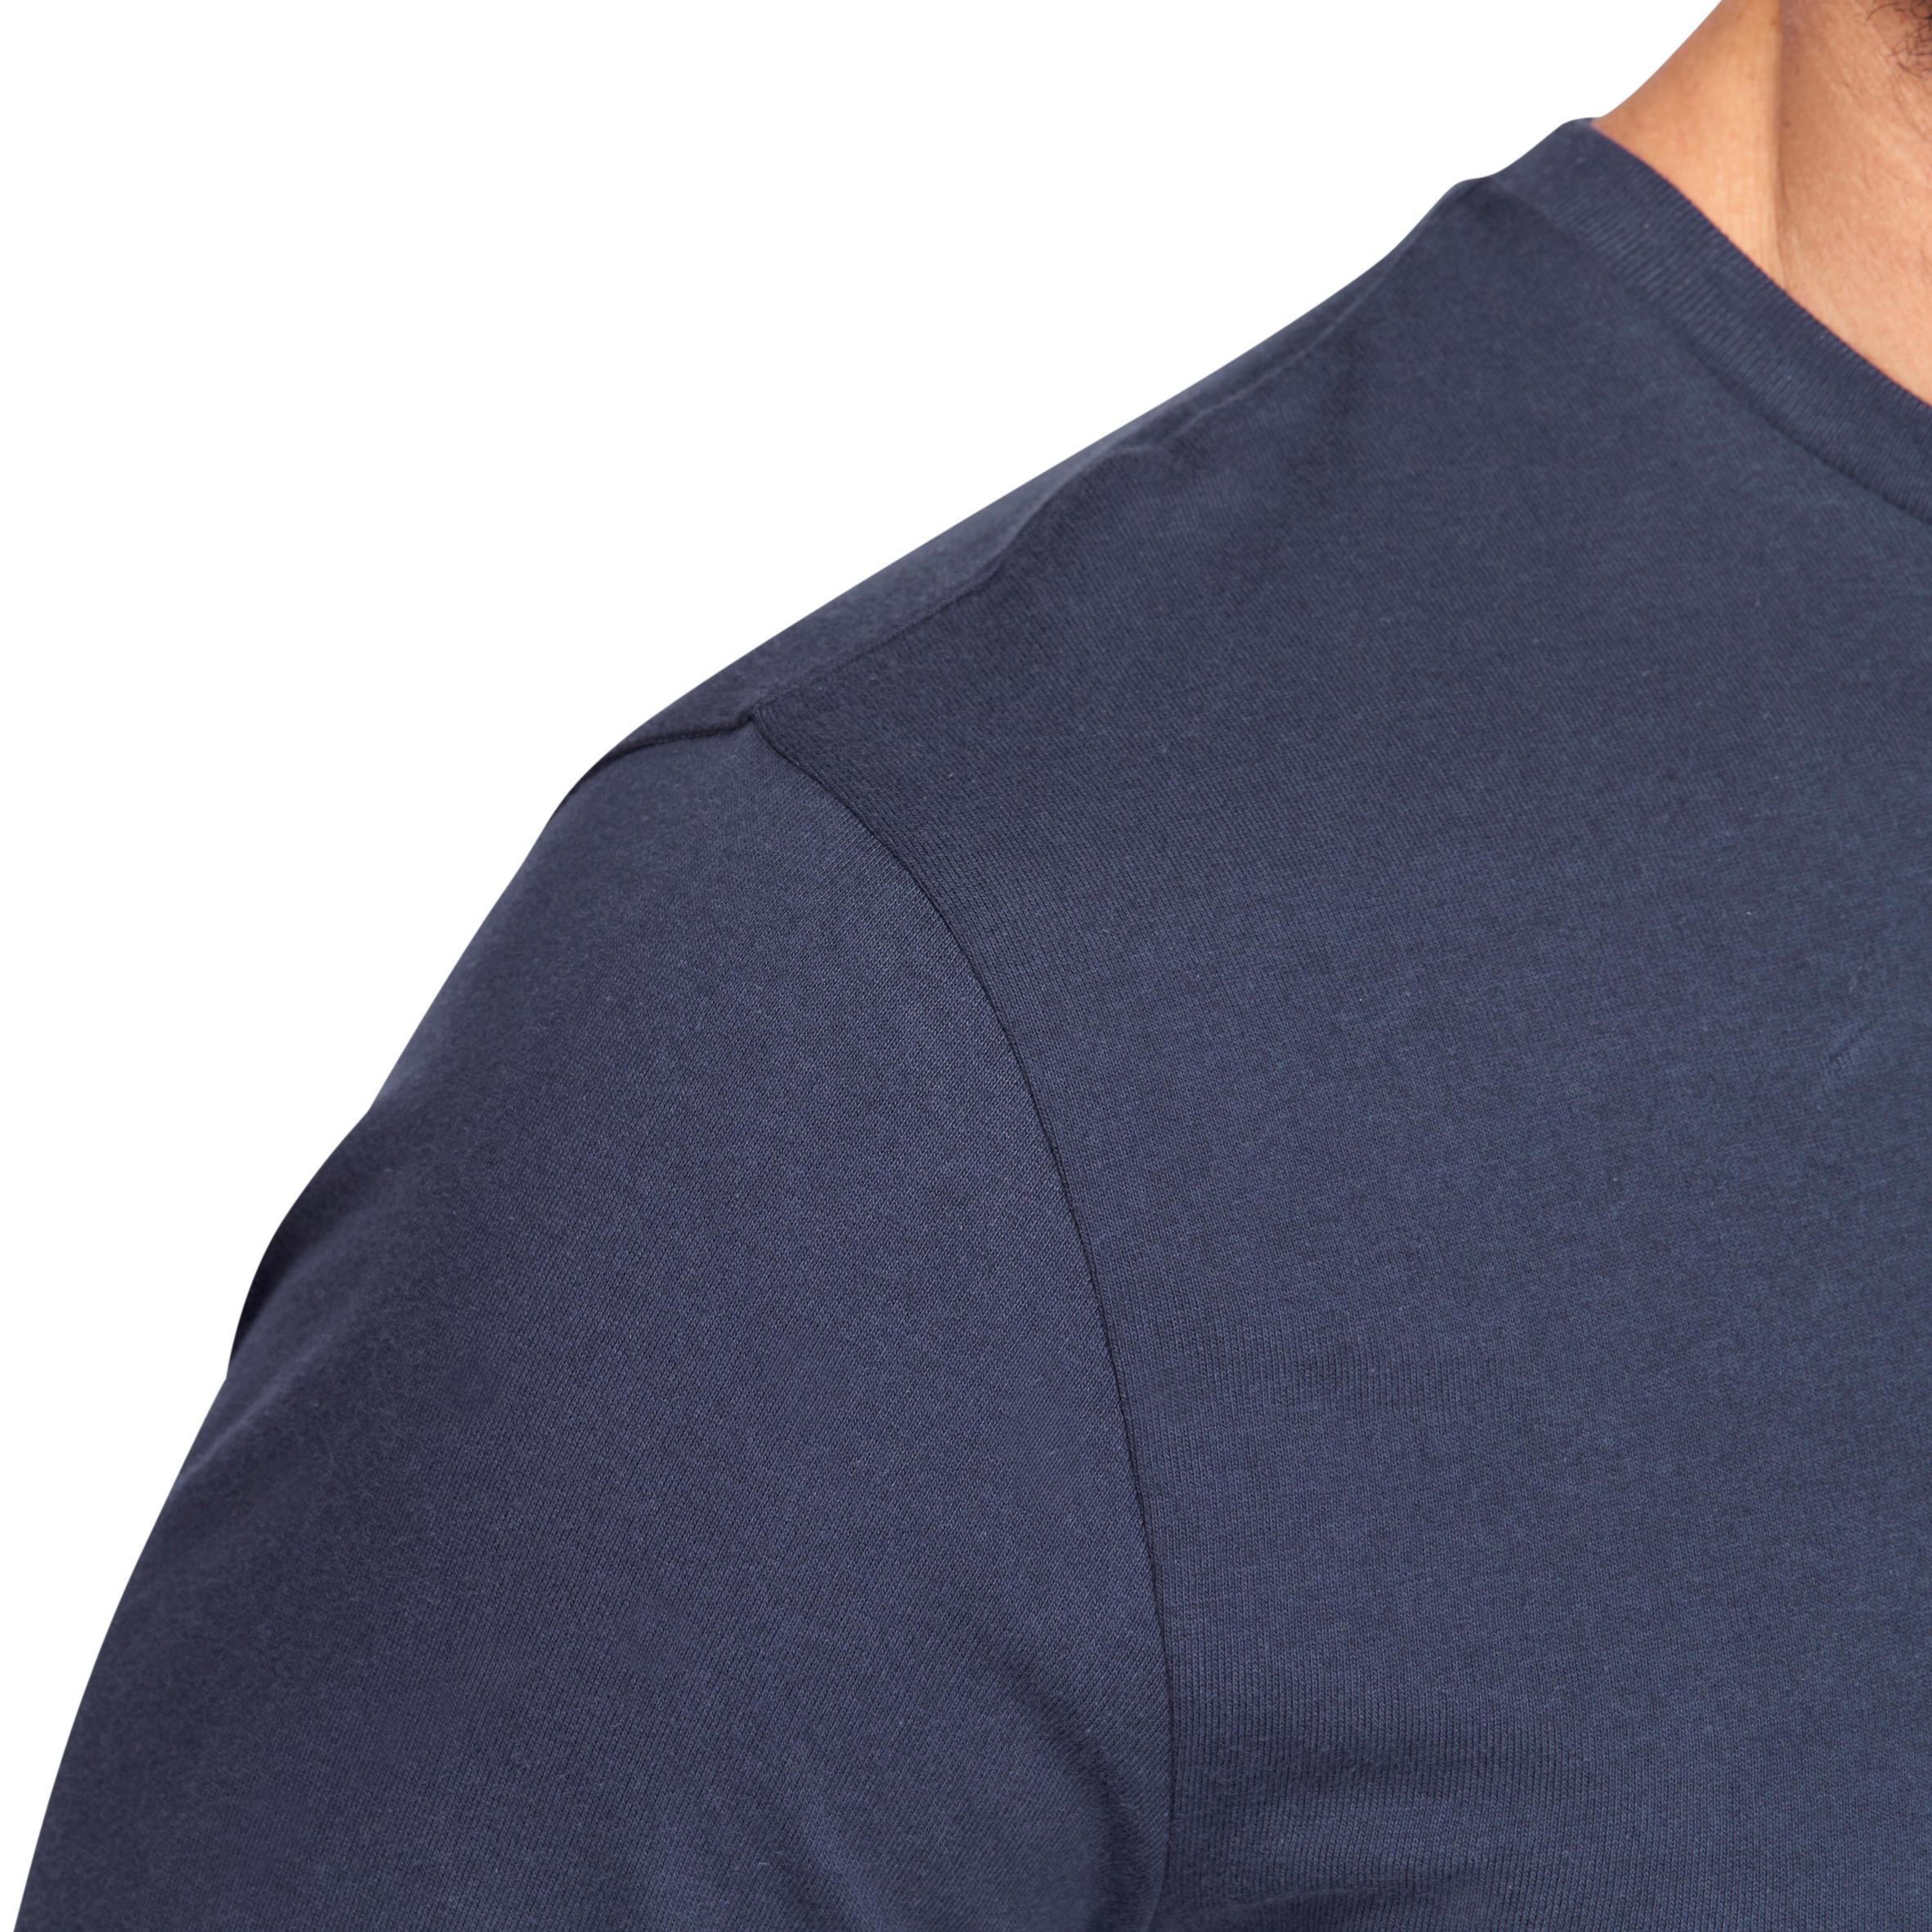 120 Long-Sleeved Pilates & Gentle Gym T-Shirt - Navy Blue